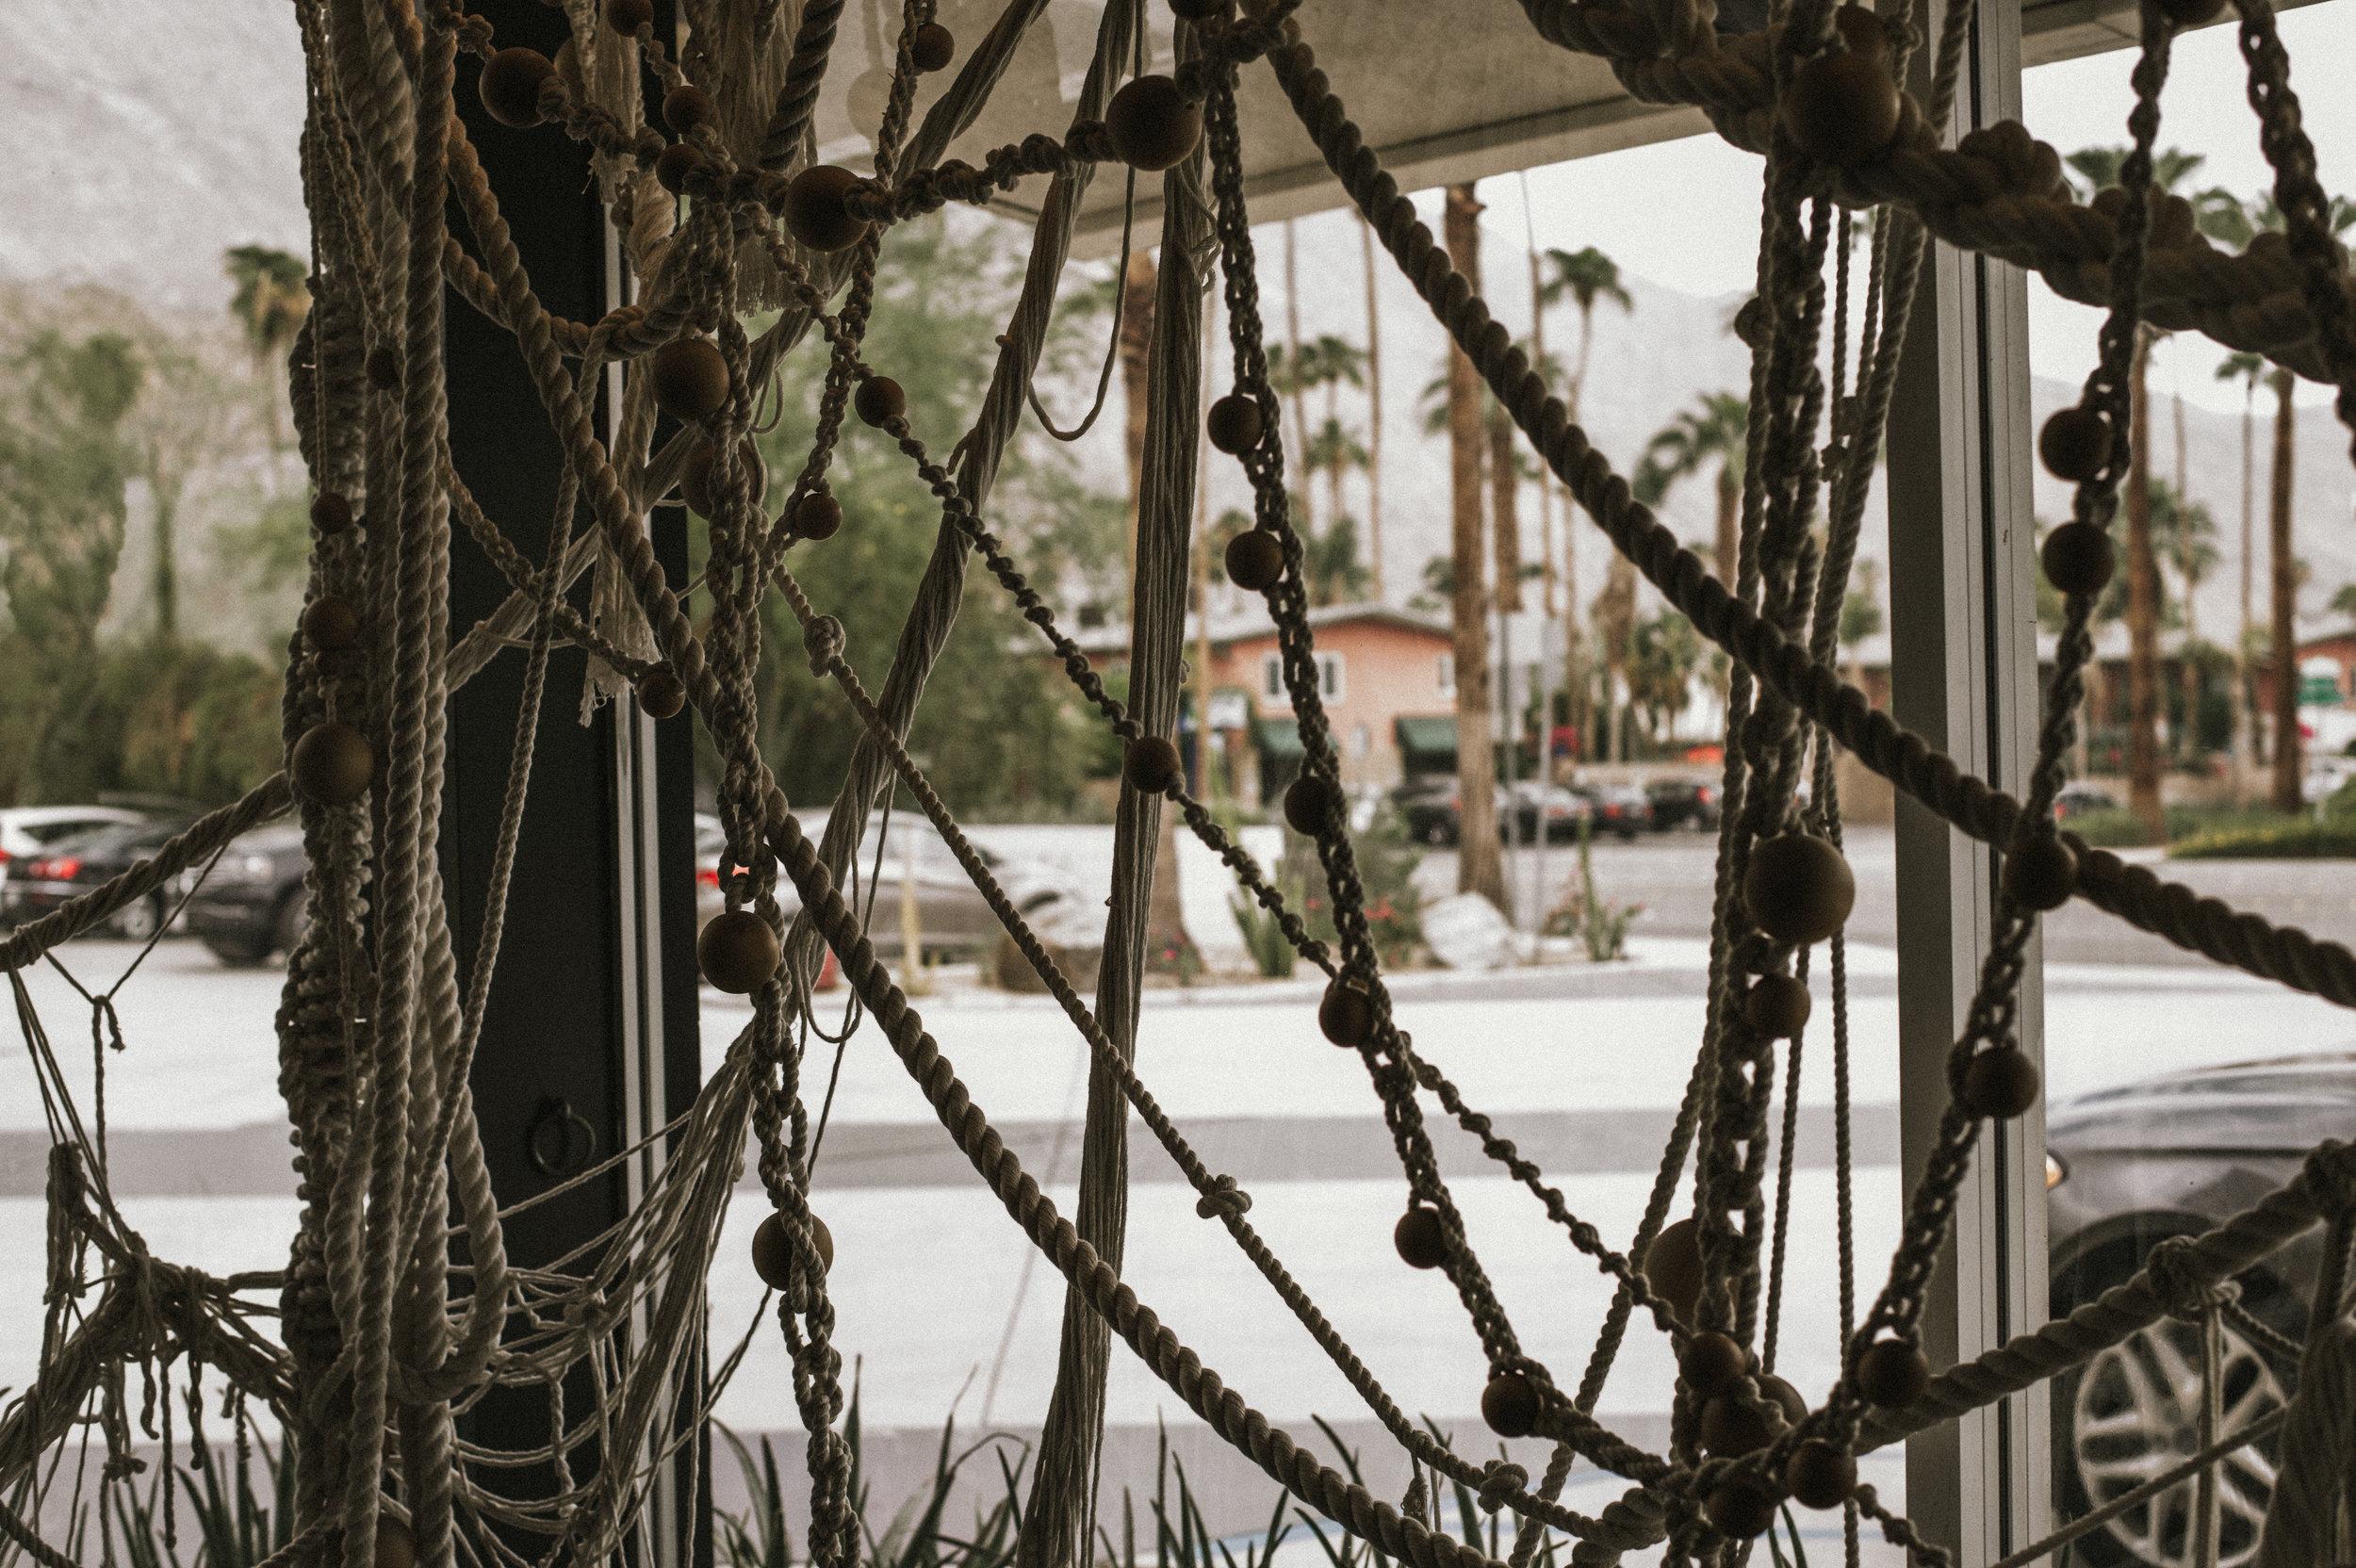 The-Glossier-Ace-Hotel-Palm-Springs-CA-62.jpg